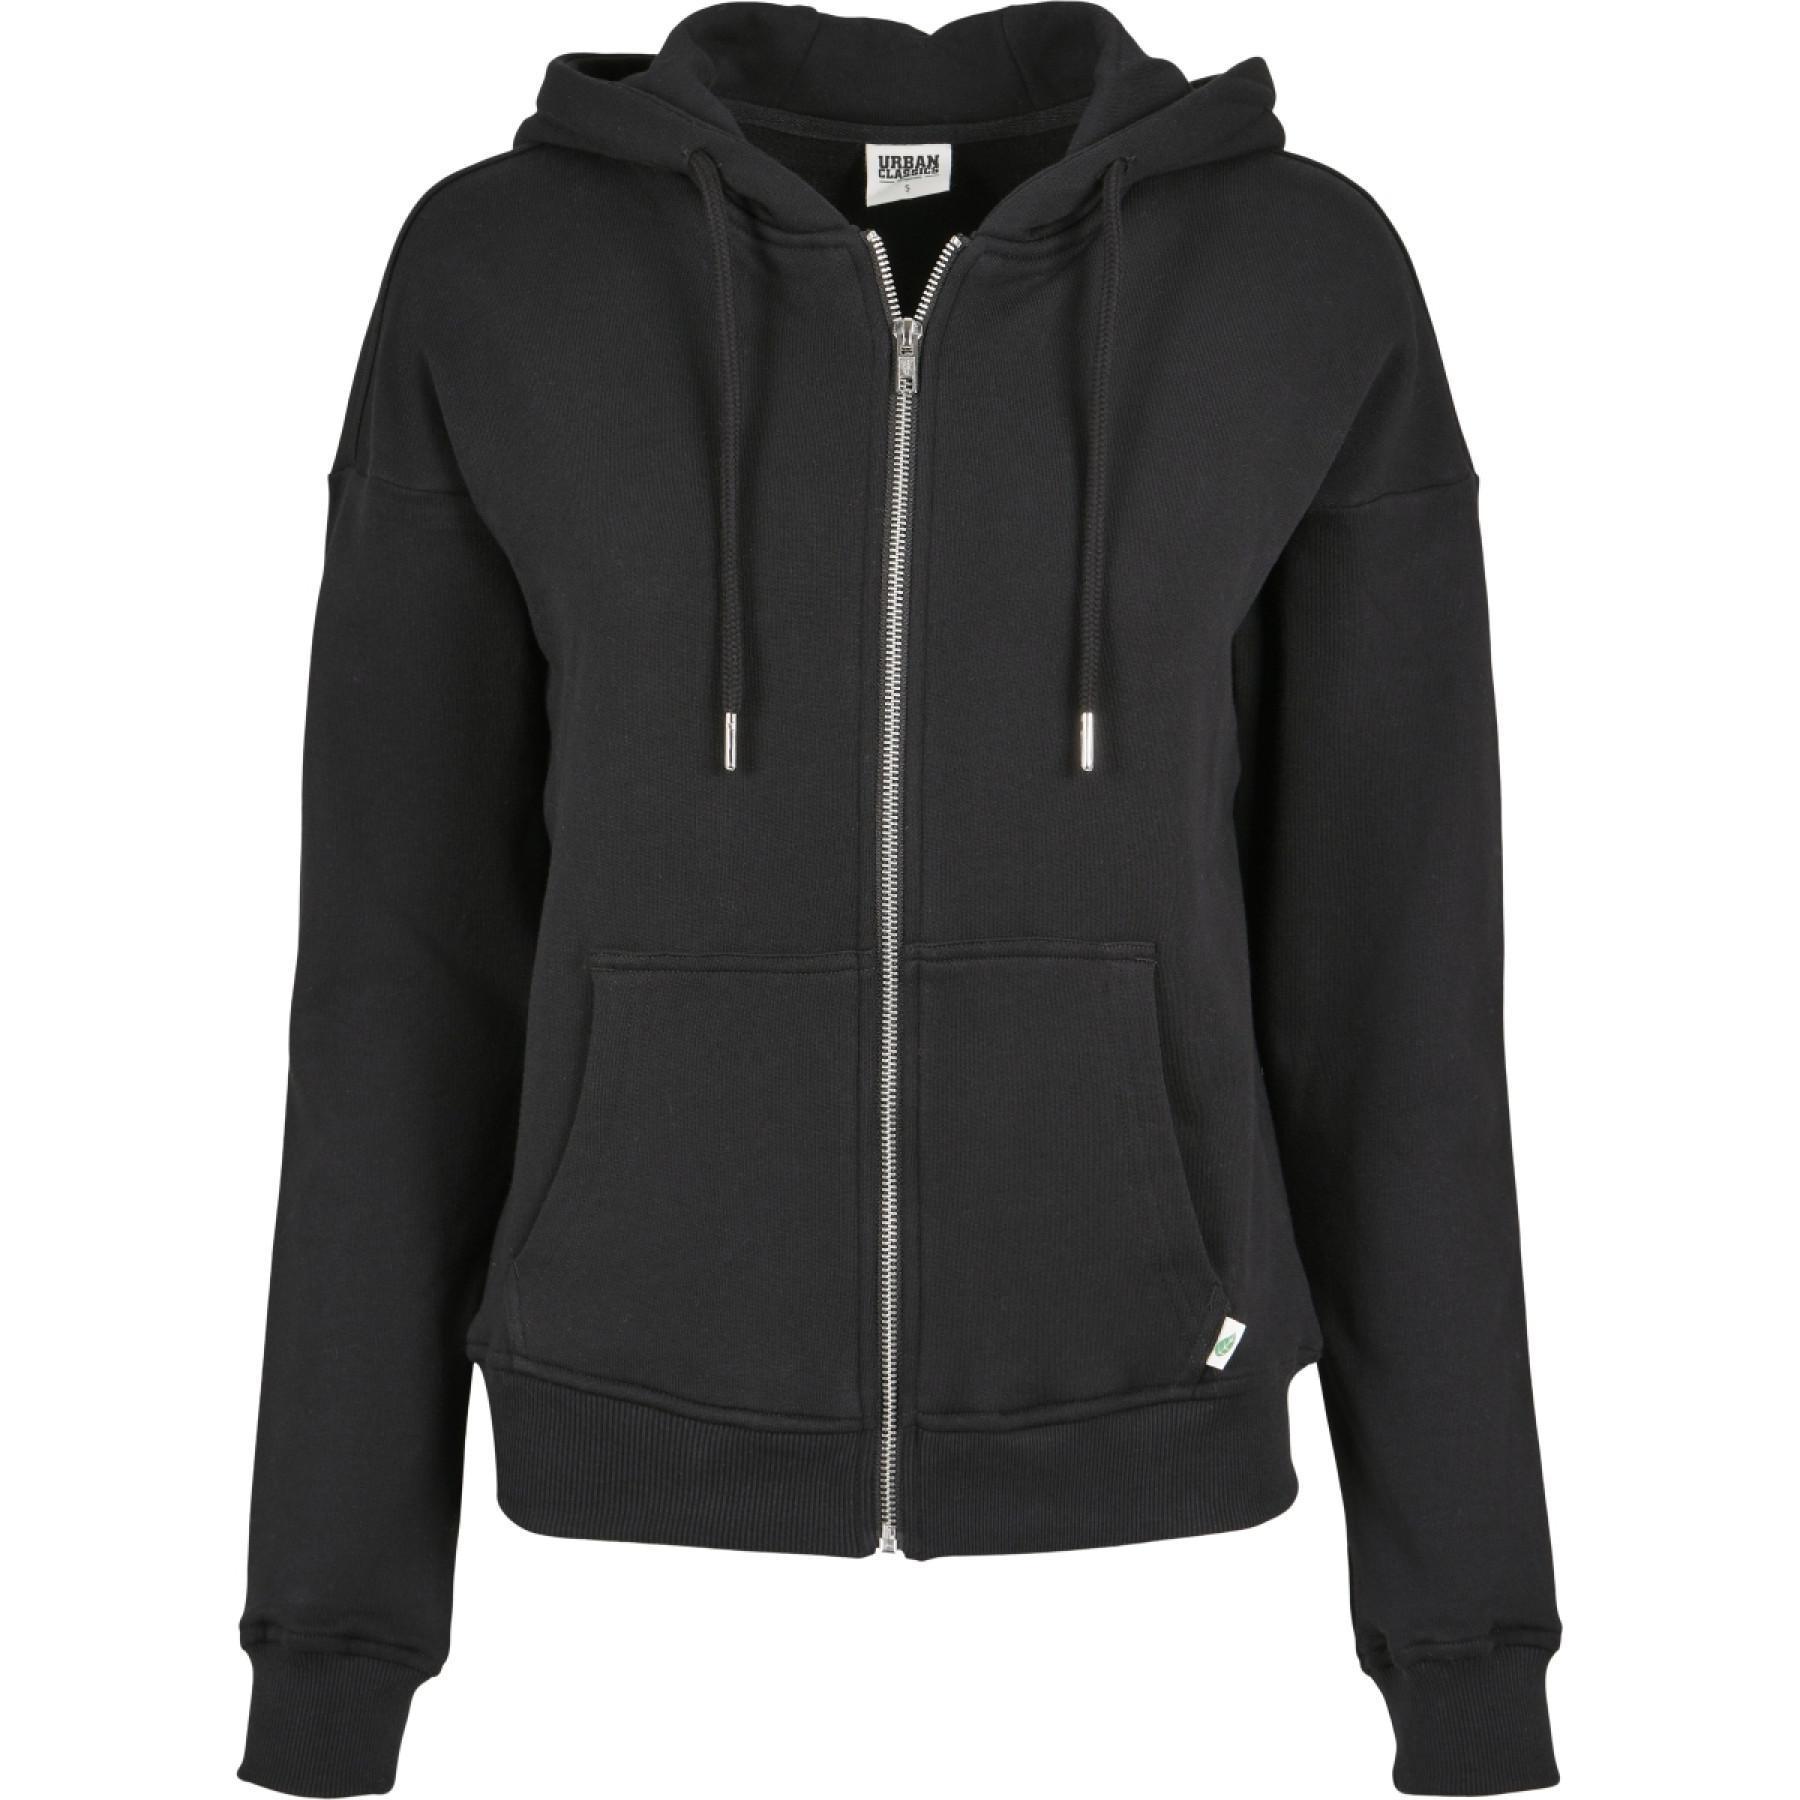 Urban Classics women's organic terry zip sweatshirt-large sizes